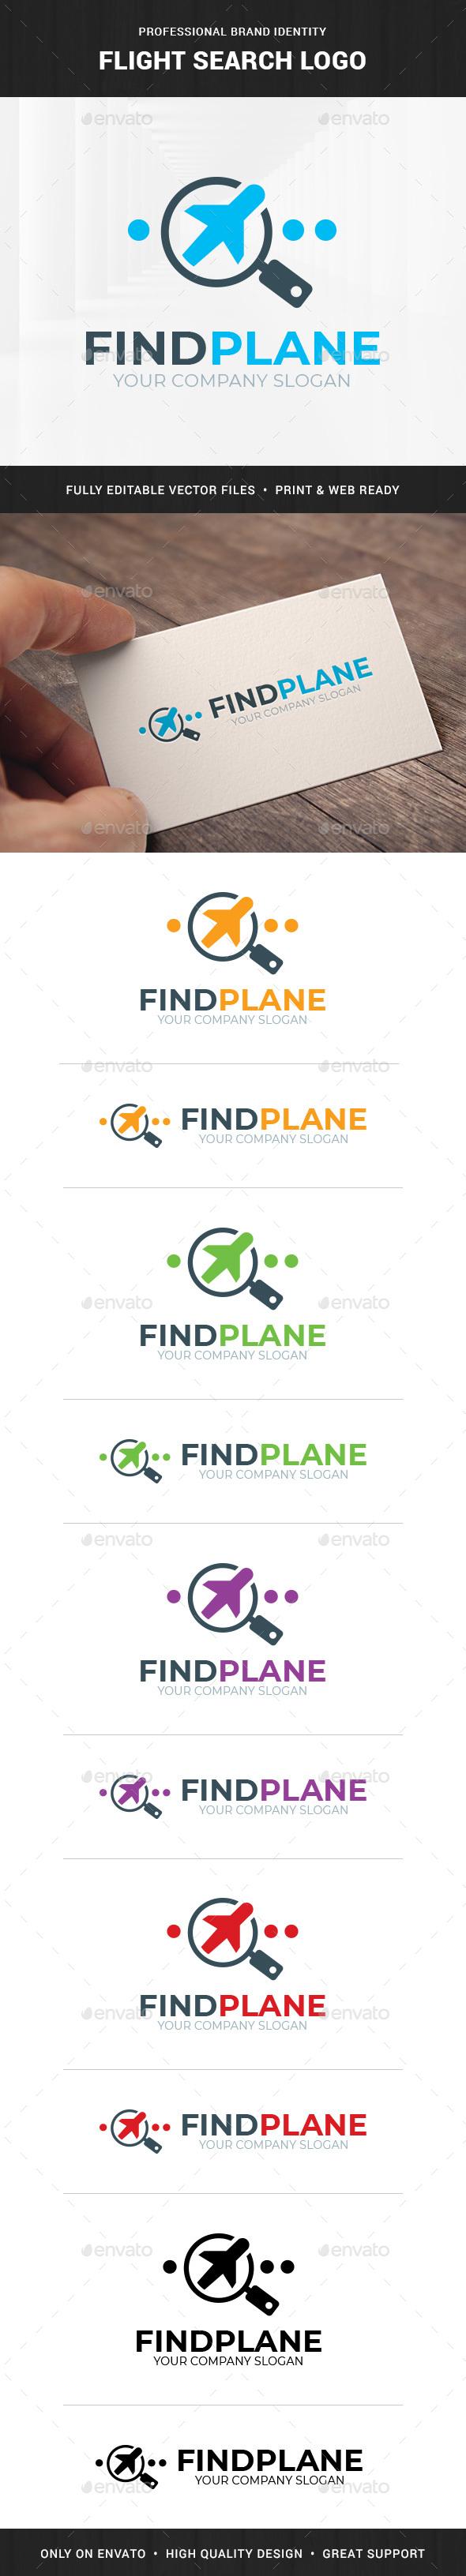 Flight Search Logo Template